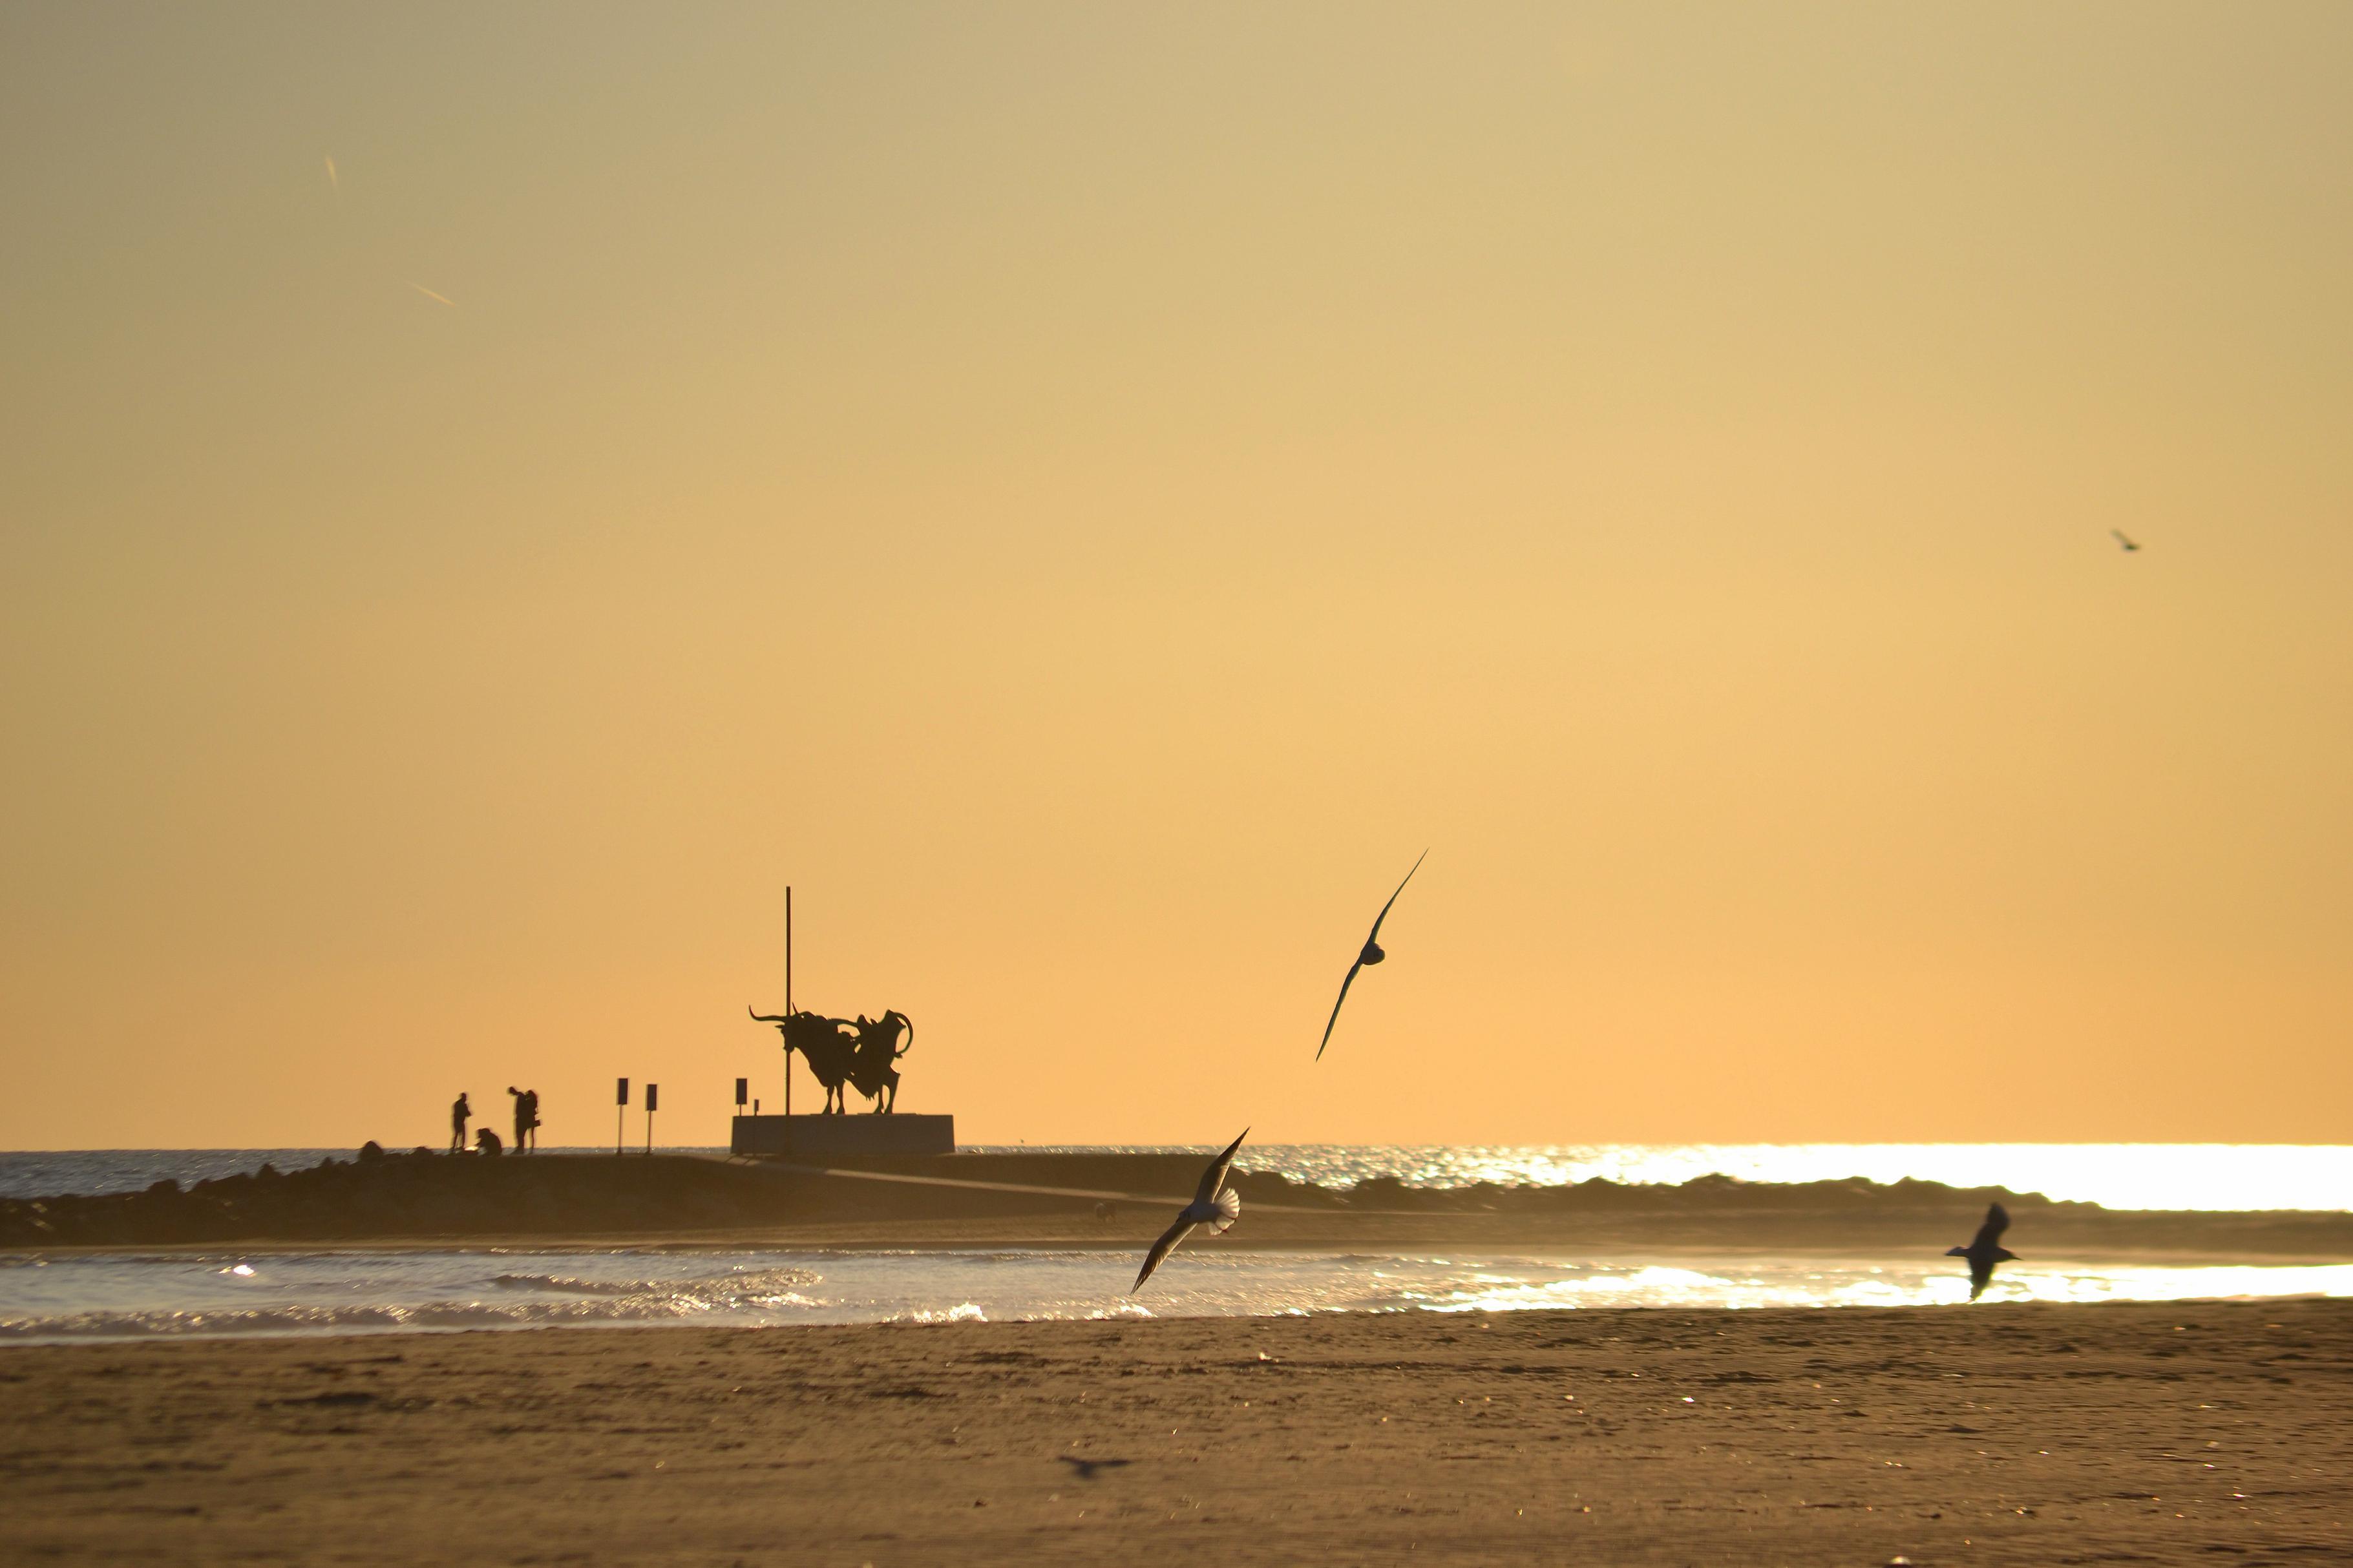 vilanova playa: